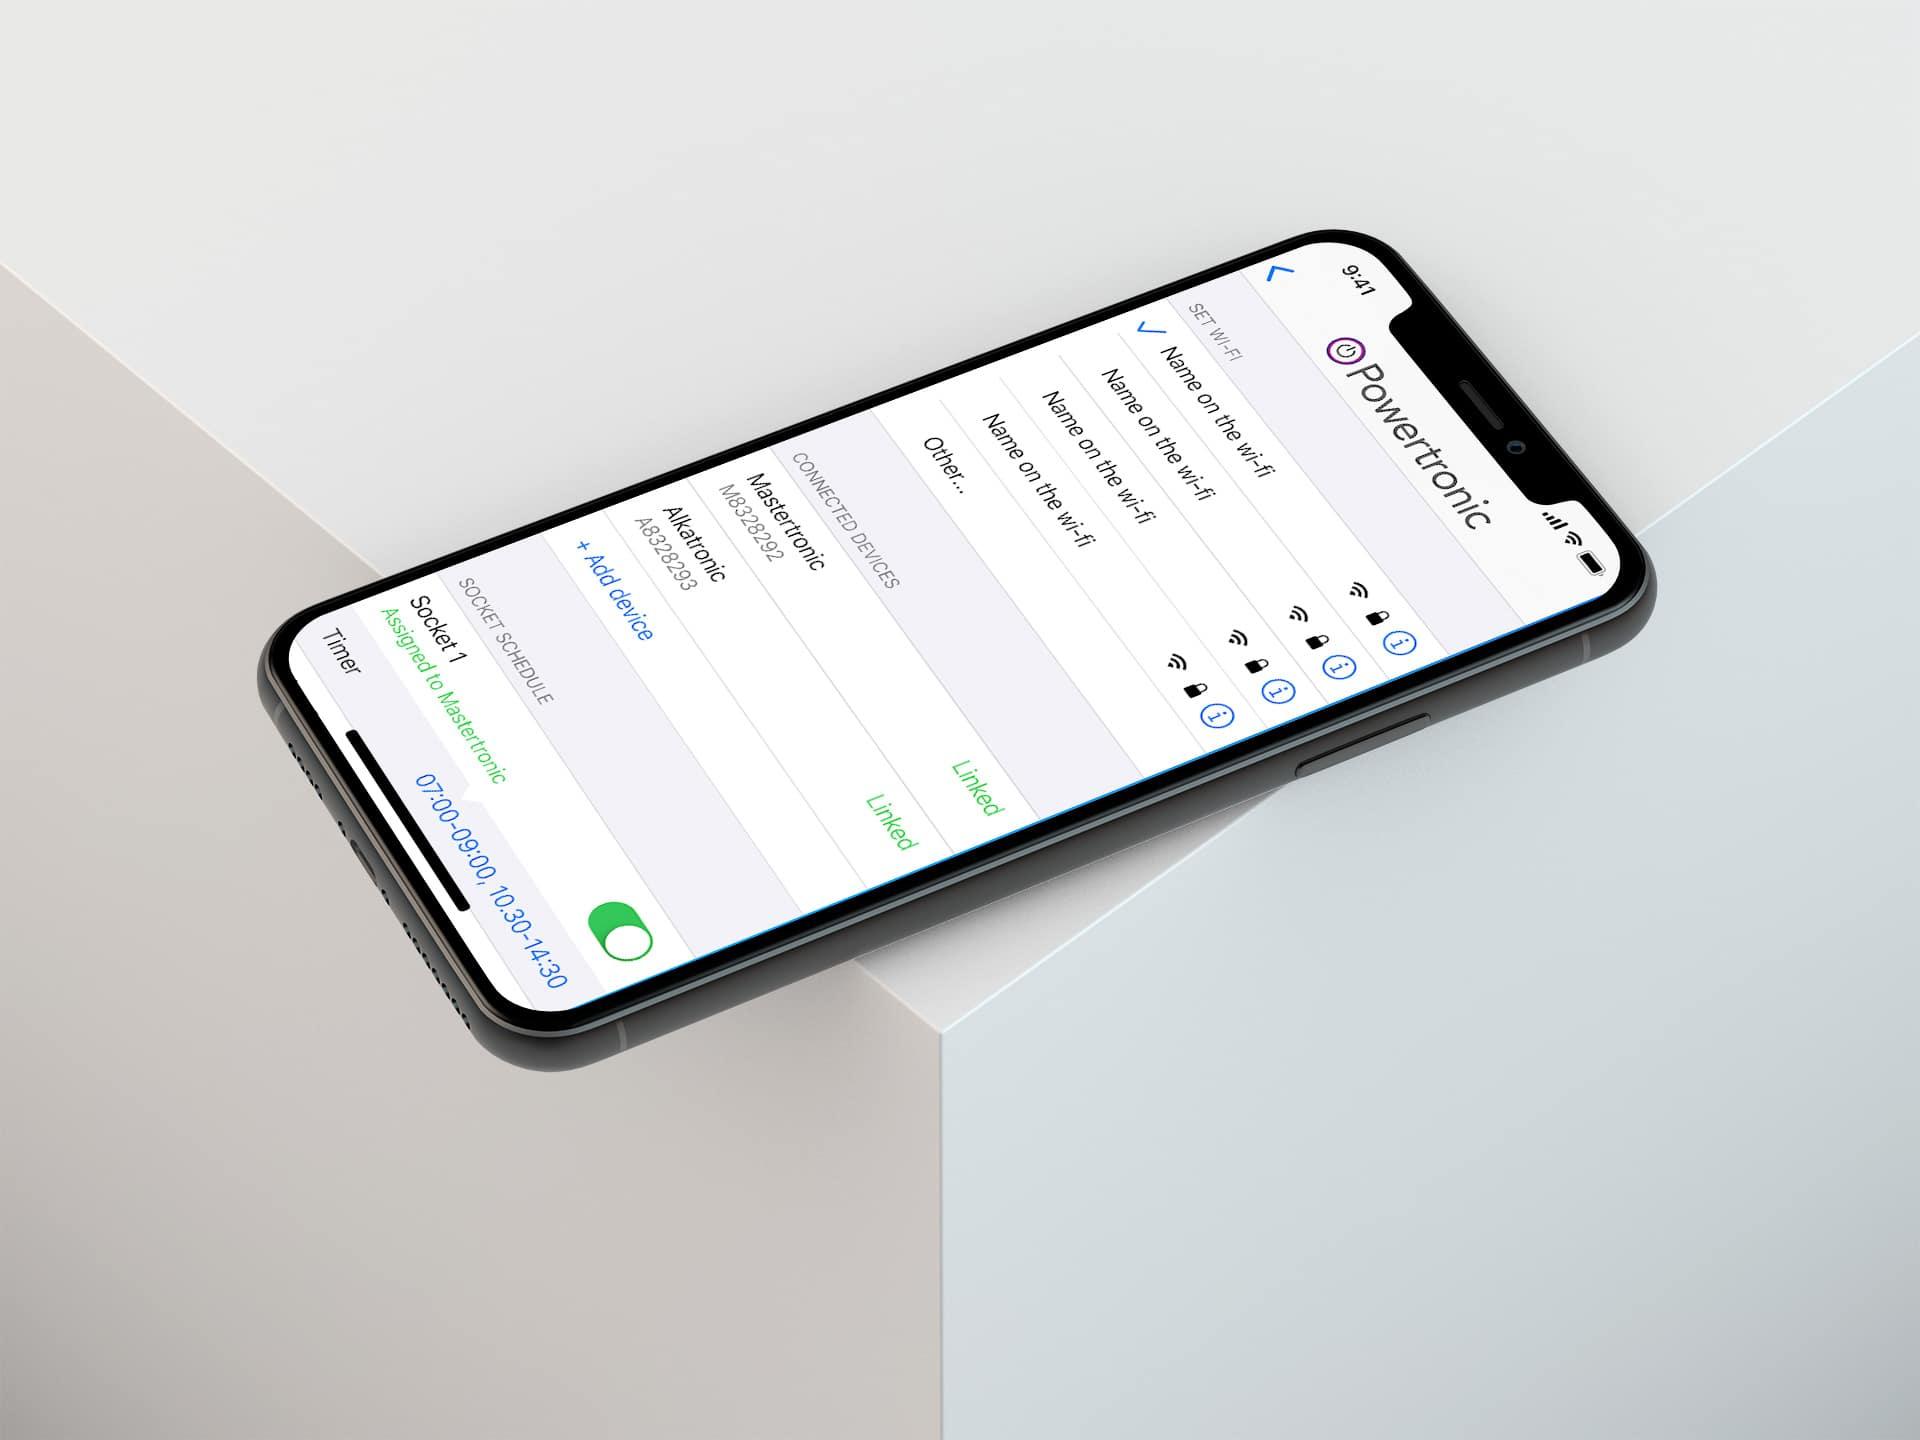 powertronic appdesign app